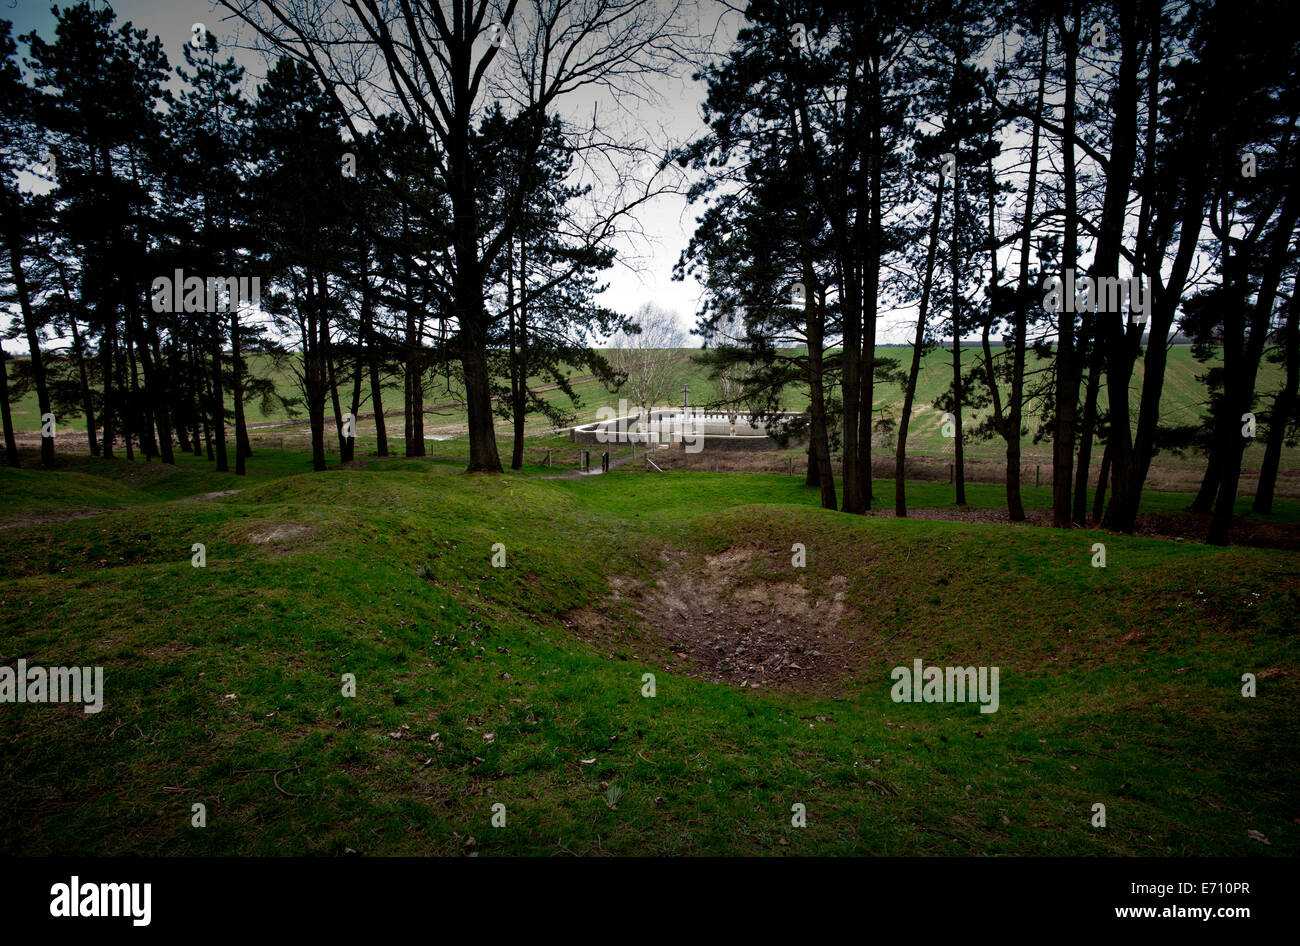 Somme WW1 Battlefield, July 1st-November 1916, France. Sheffield Memorial Park. February 2014 Seen Here: Railwat - Stock Image